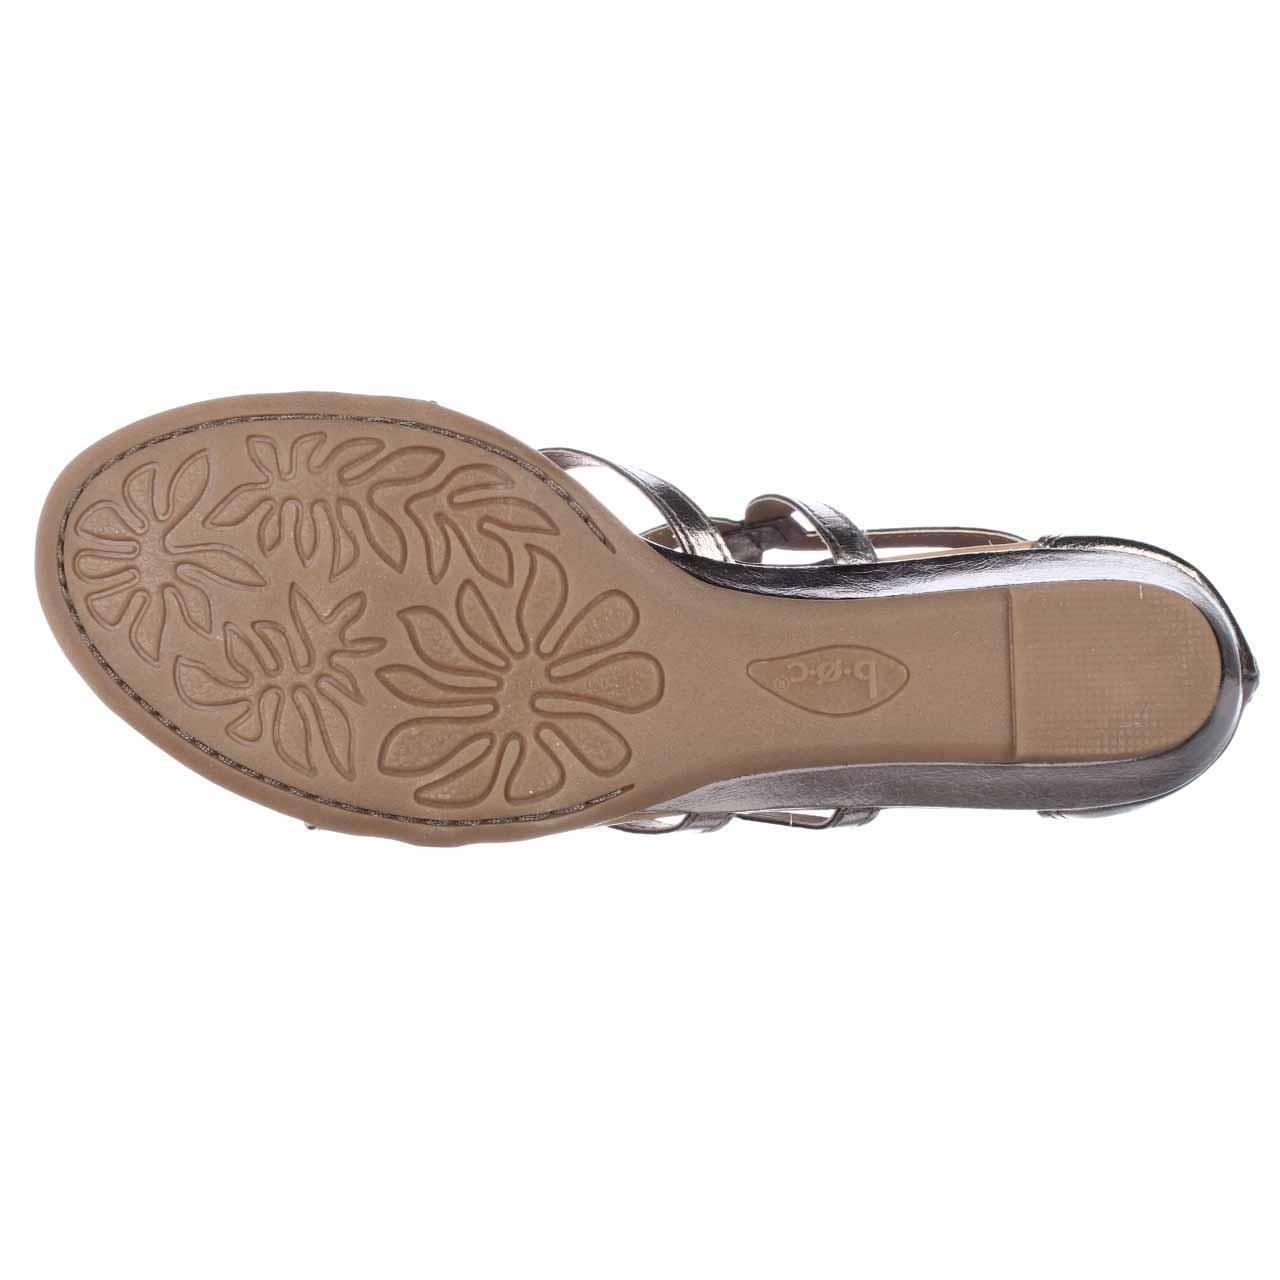 c1c68ab76f42 Shop B.O.C. Born Concept Pawel Low Wedge Gladiator Sandals